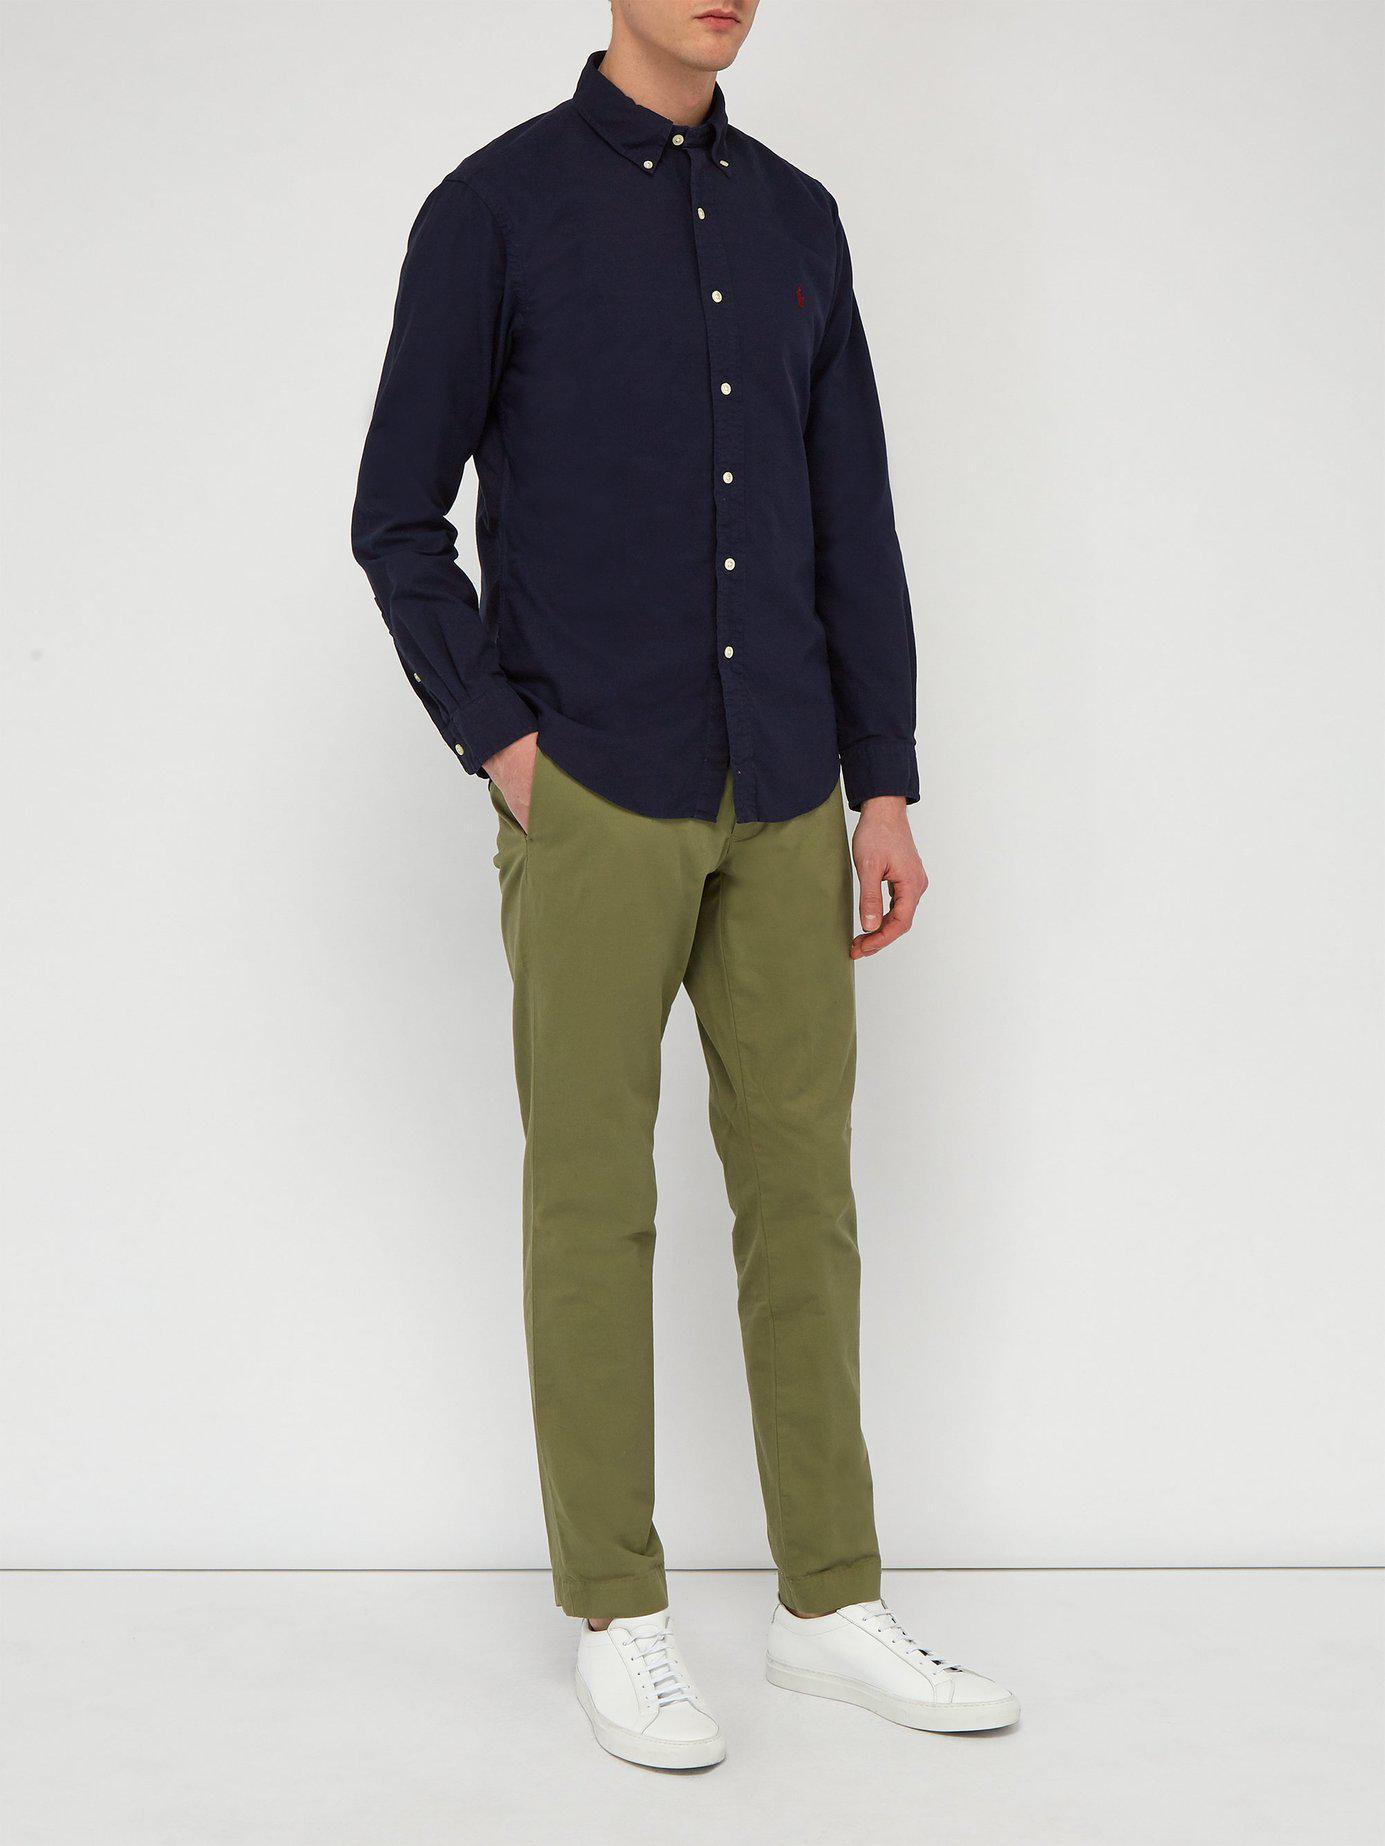 28038cde983a ... top quality polo ralph lauren blue slim fit cotton oxford shirt for men  lyst. view